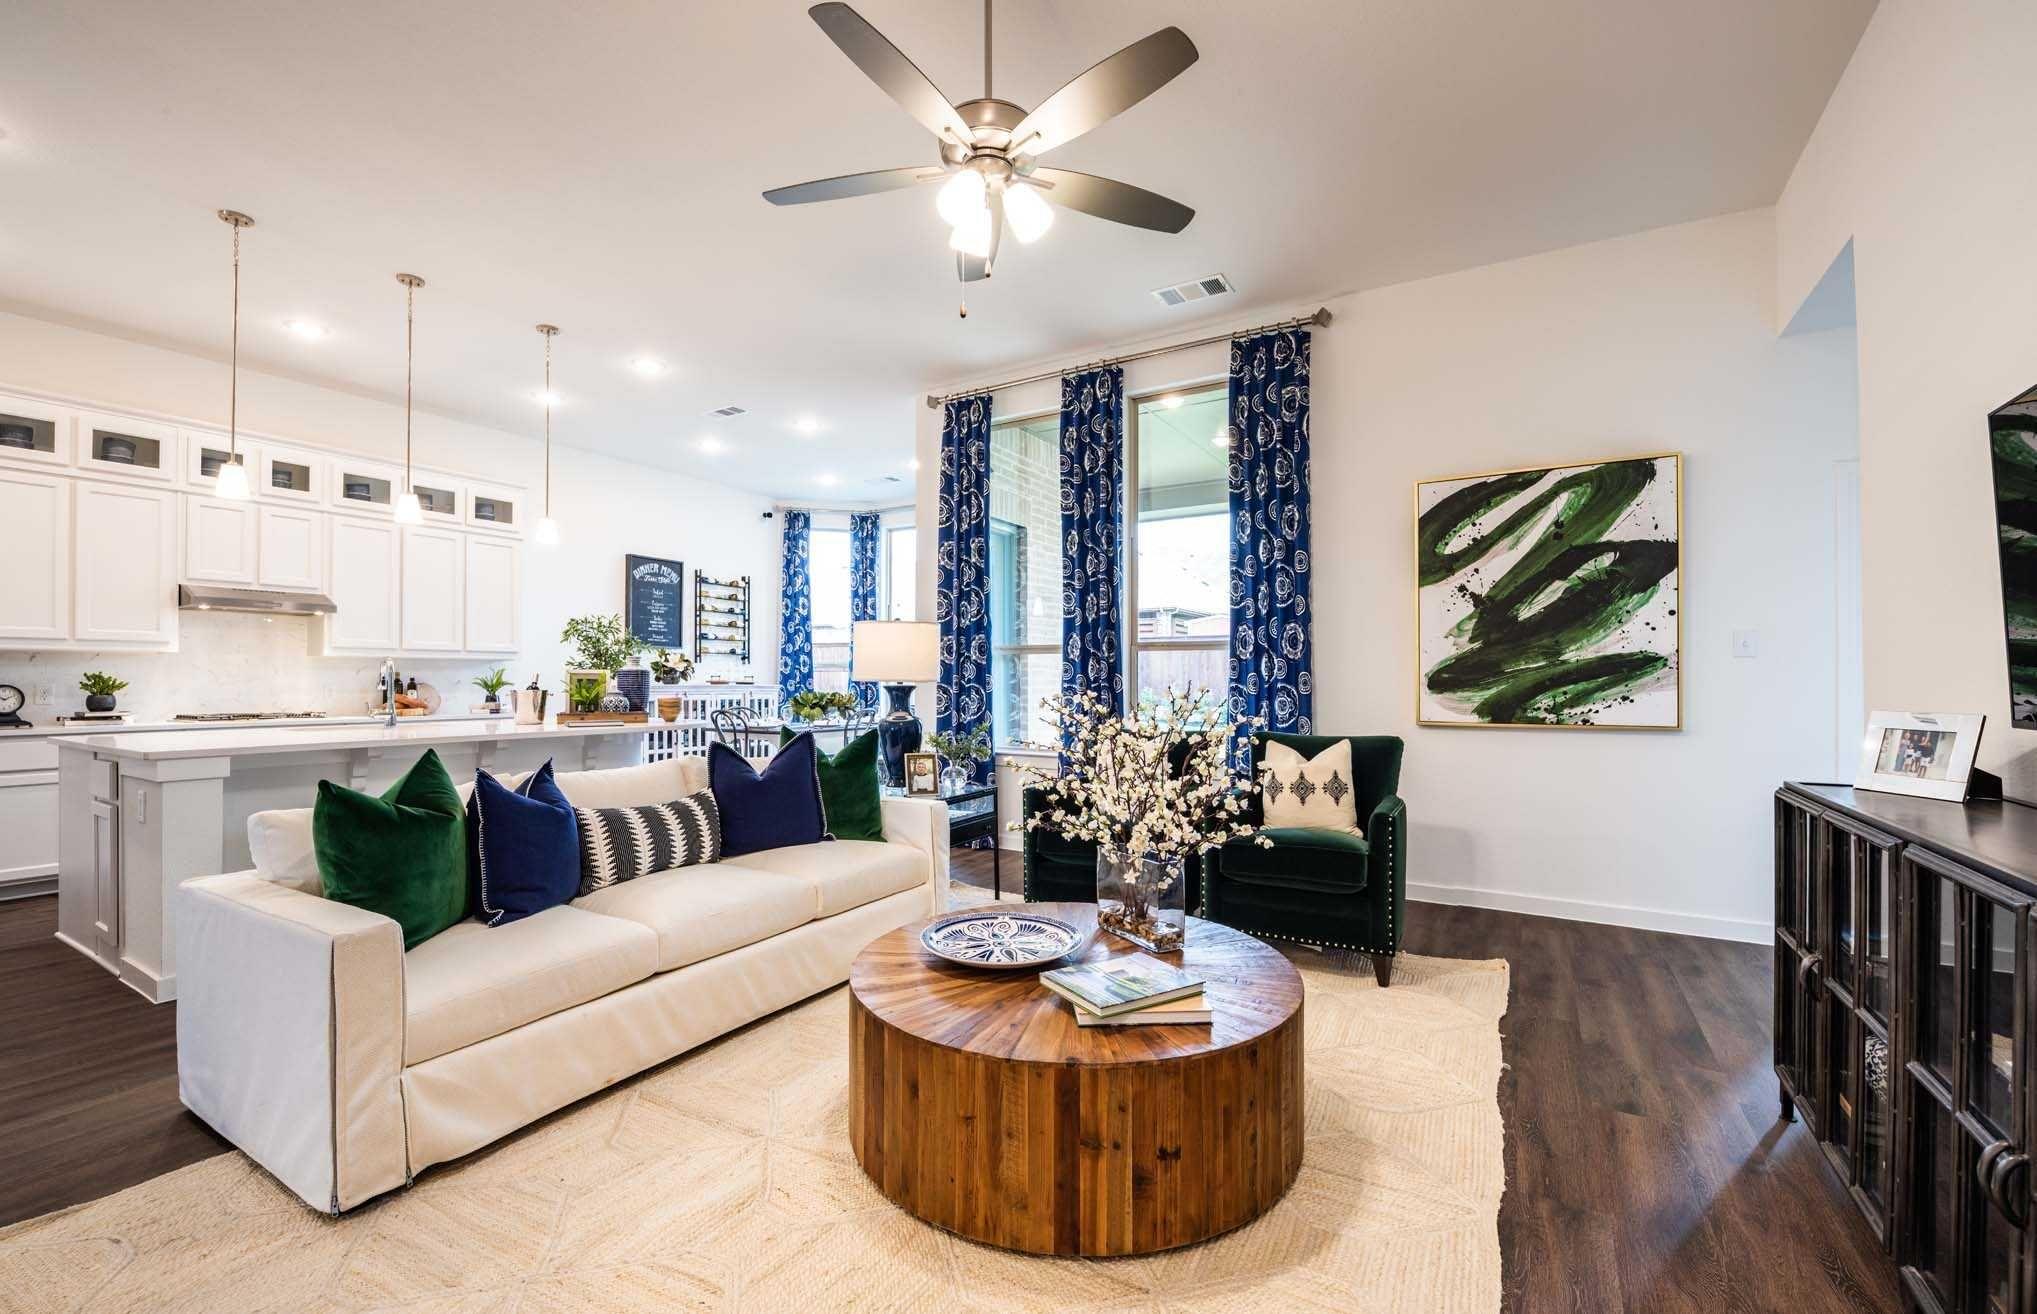 Highland Homes Amberley Plan Wylie, TX Inspiration